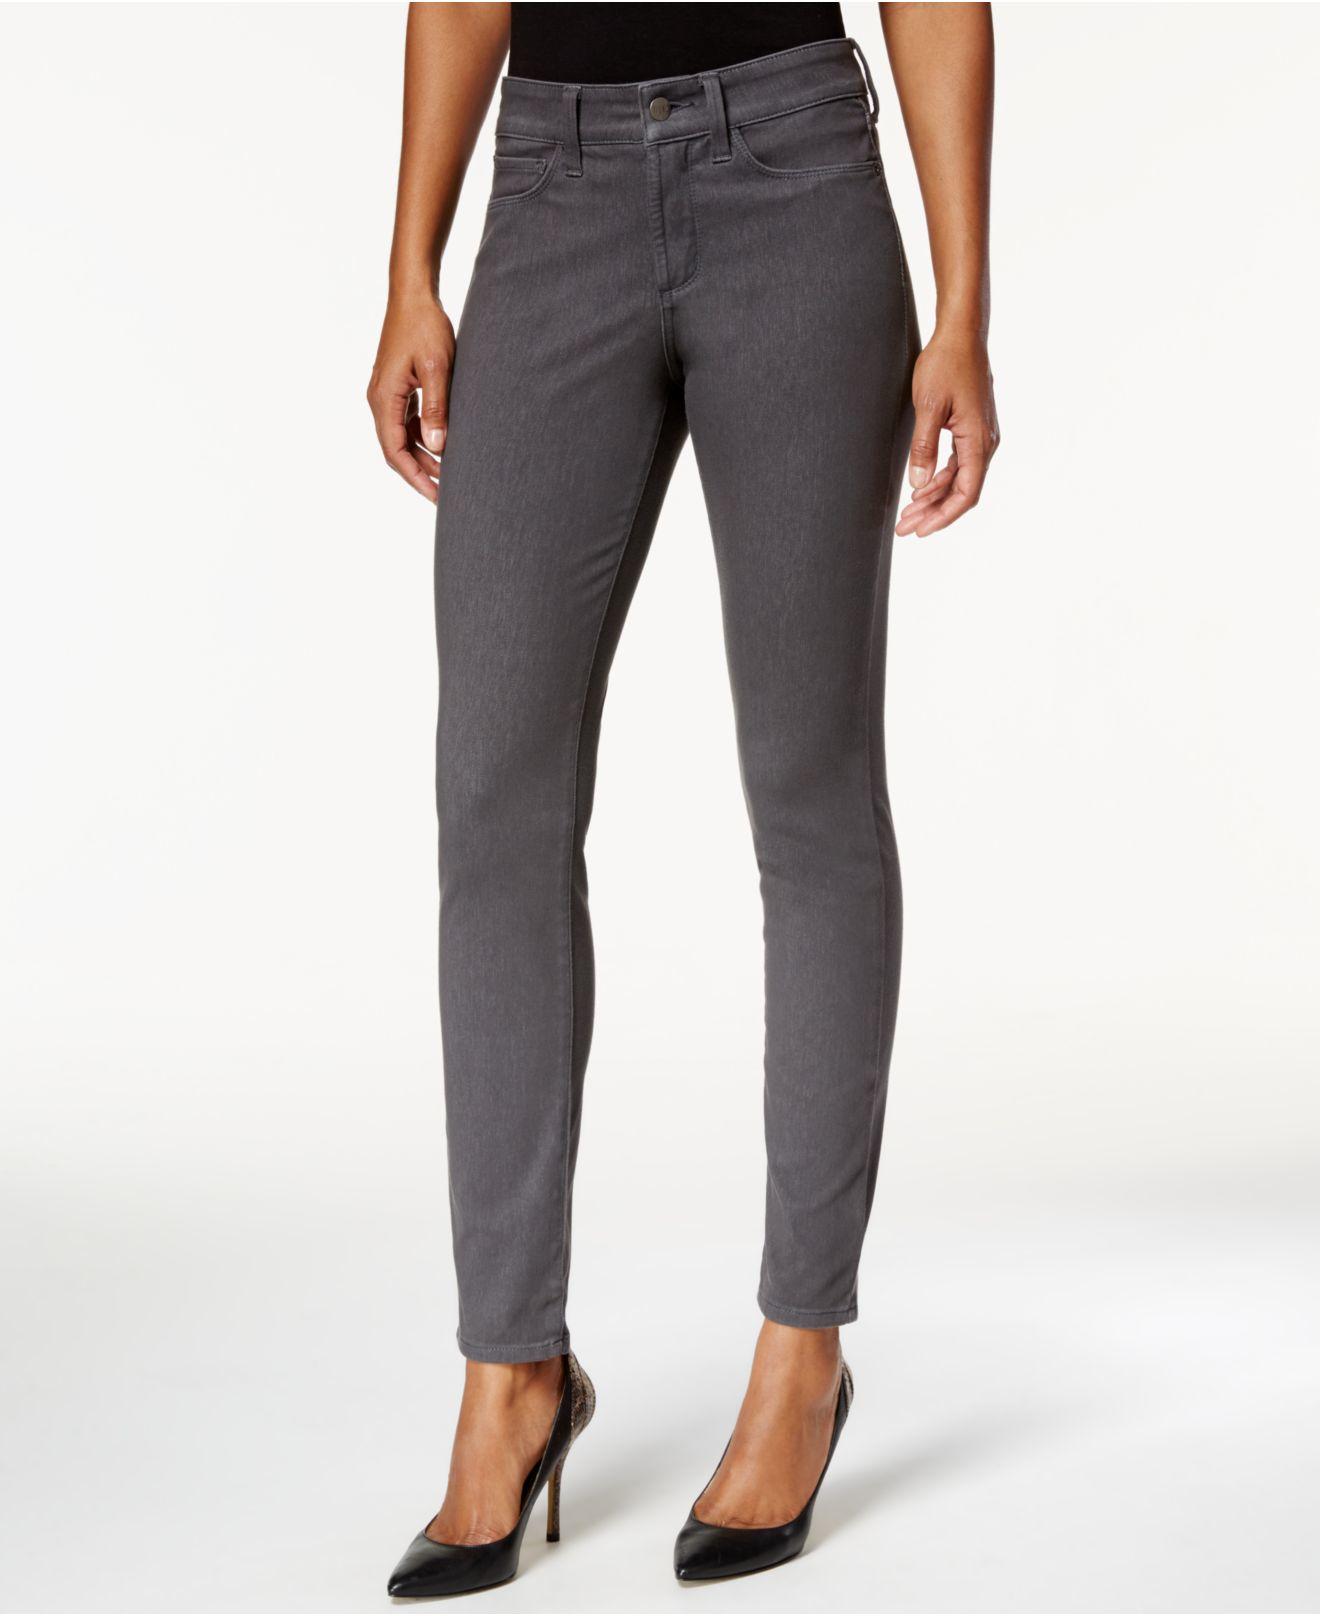 nydj alina skinny aubergine wash jeans in gray dark. Black Bedroom Furniture Sets. Home Design Ideas